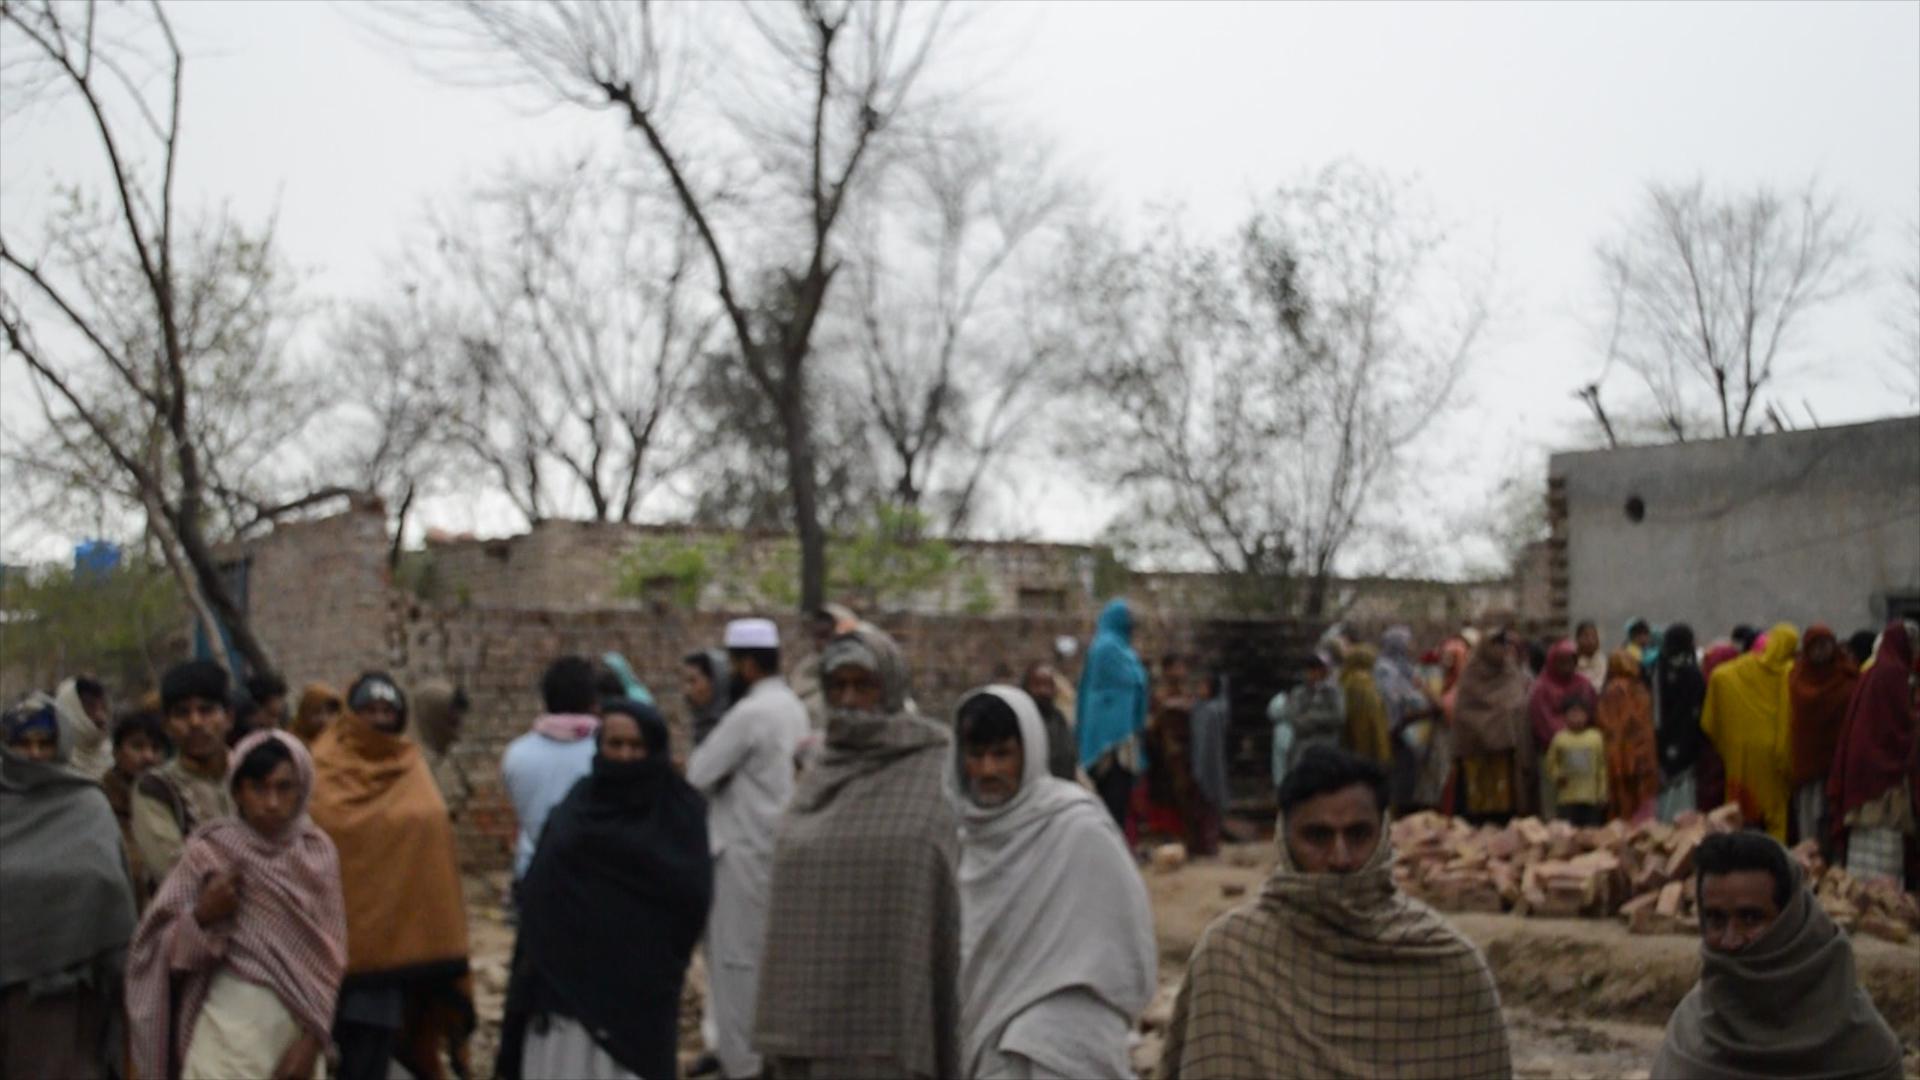 Rains wreak havoc in Punjab; 6 children killed